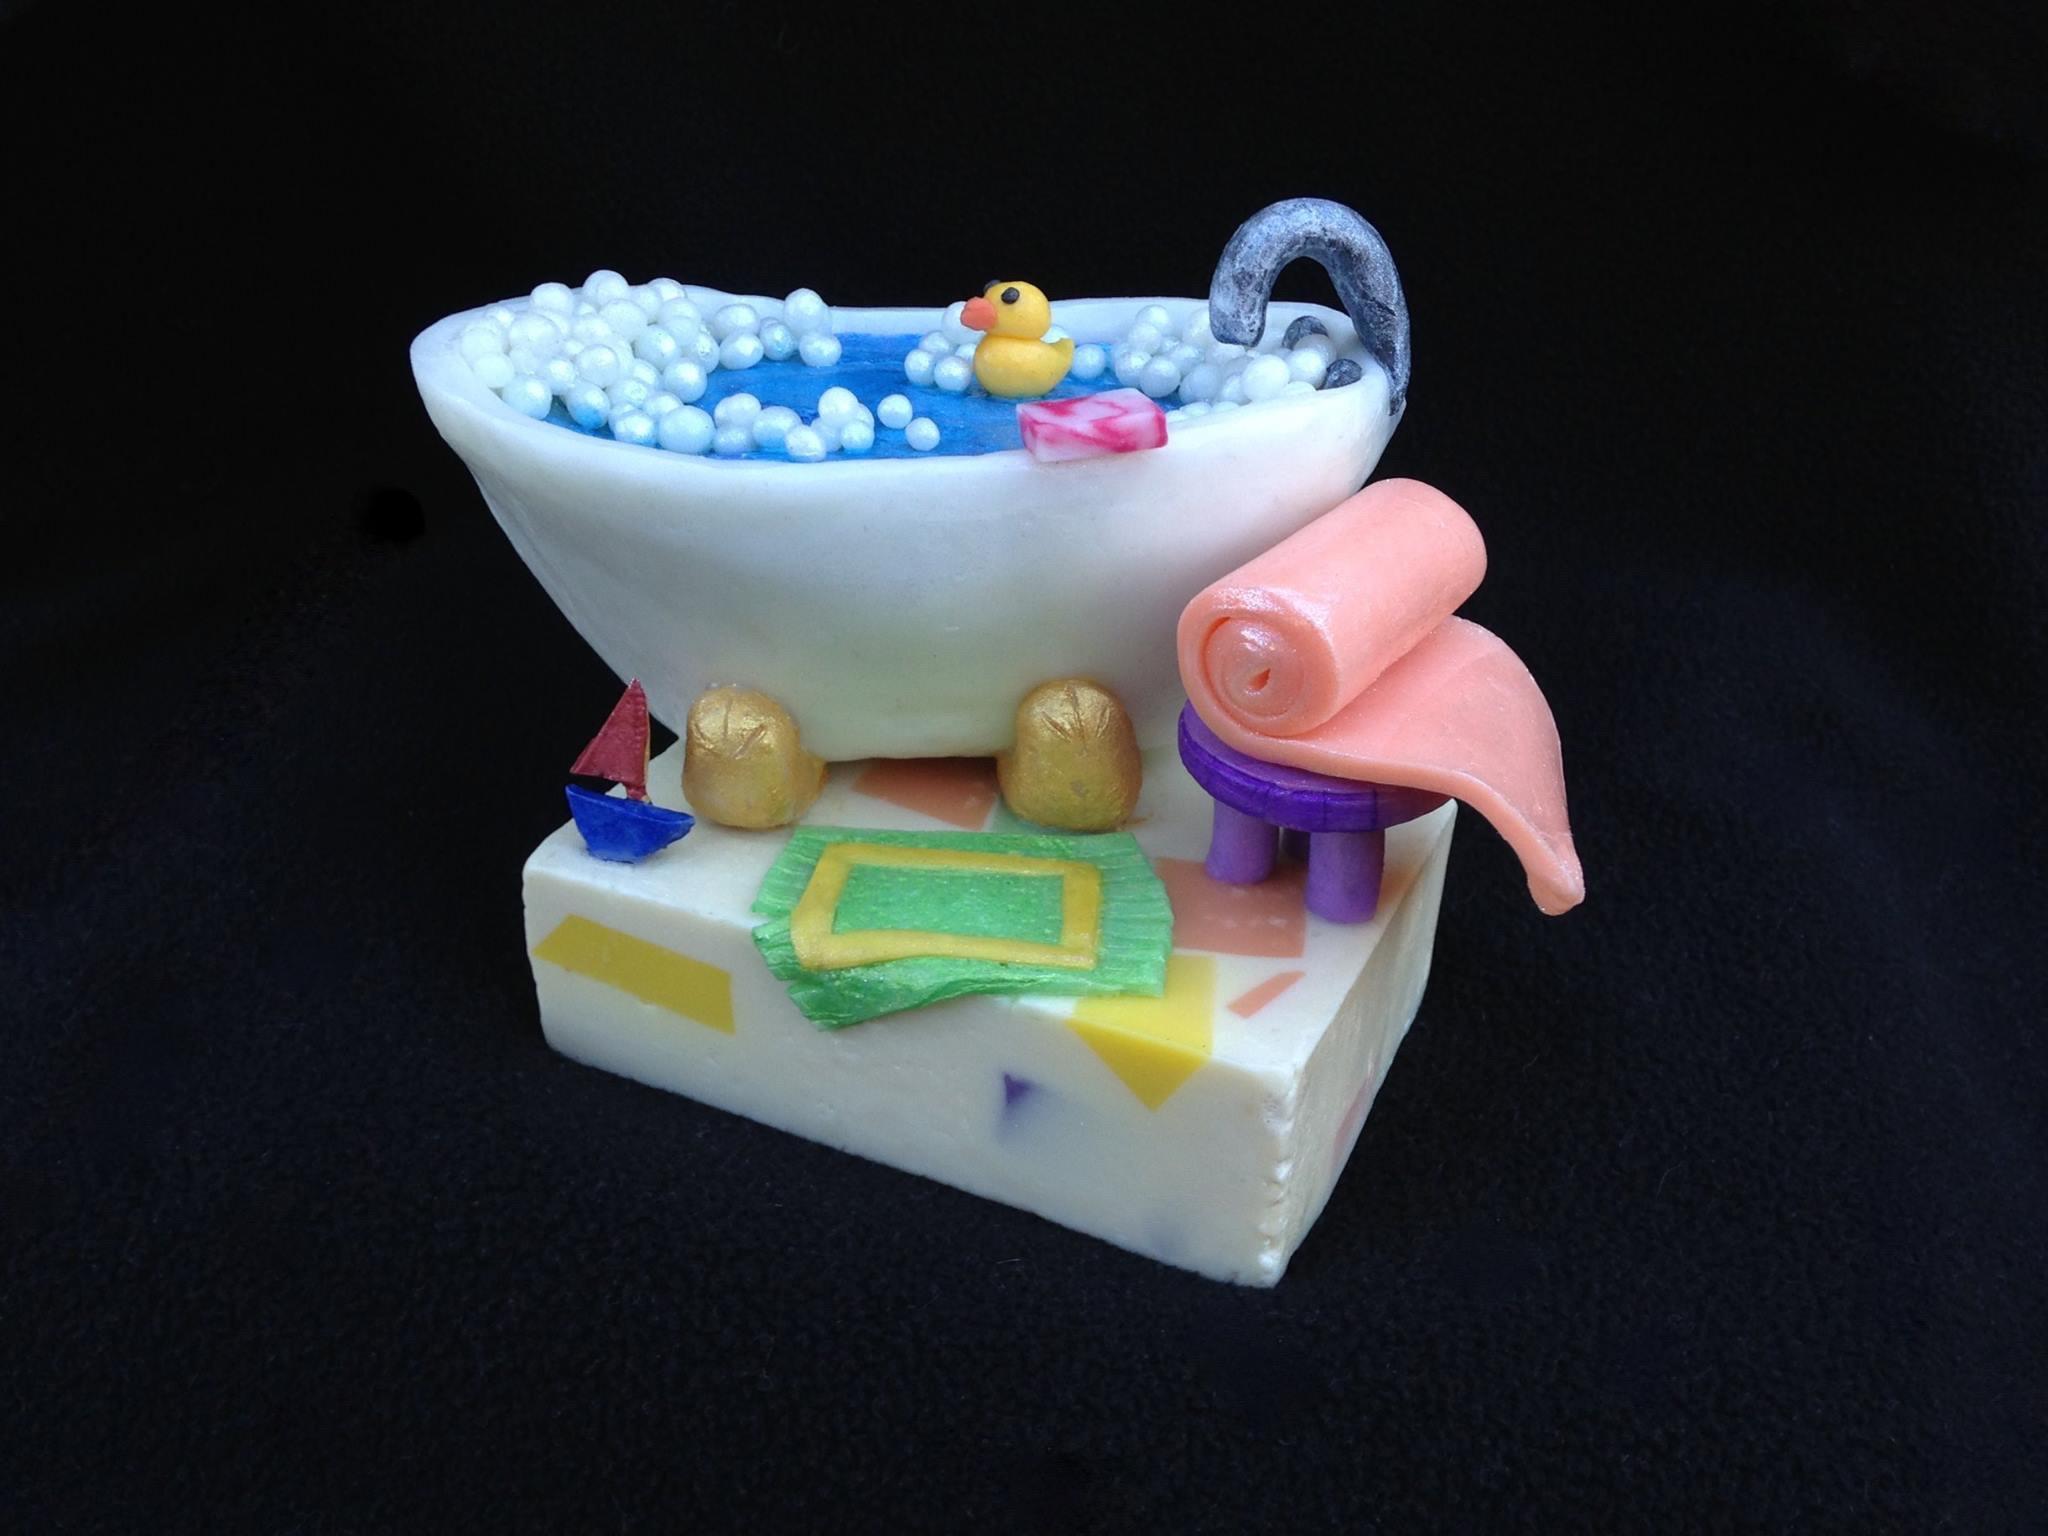 bathtime fun with rubber ducky